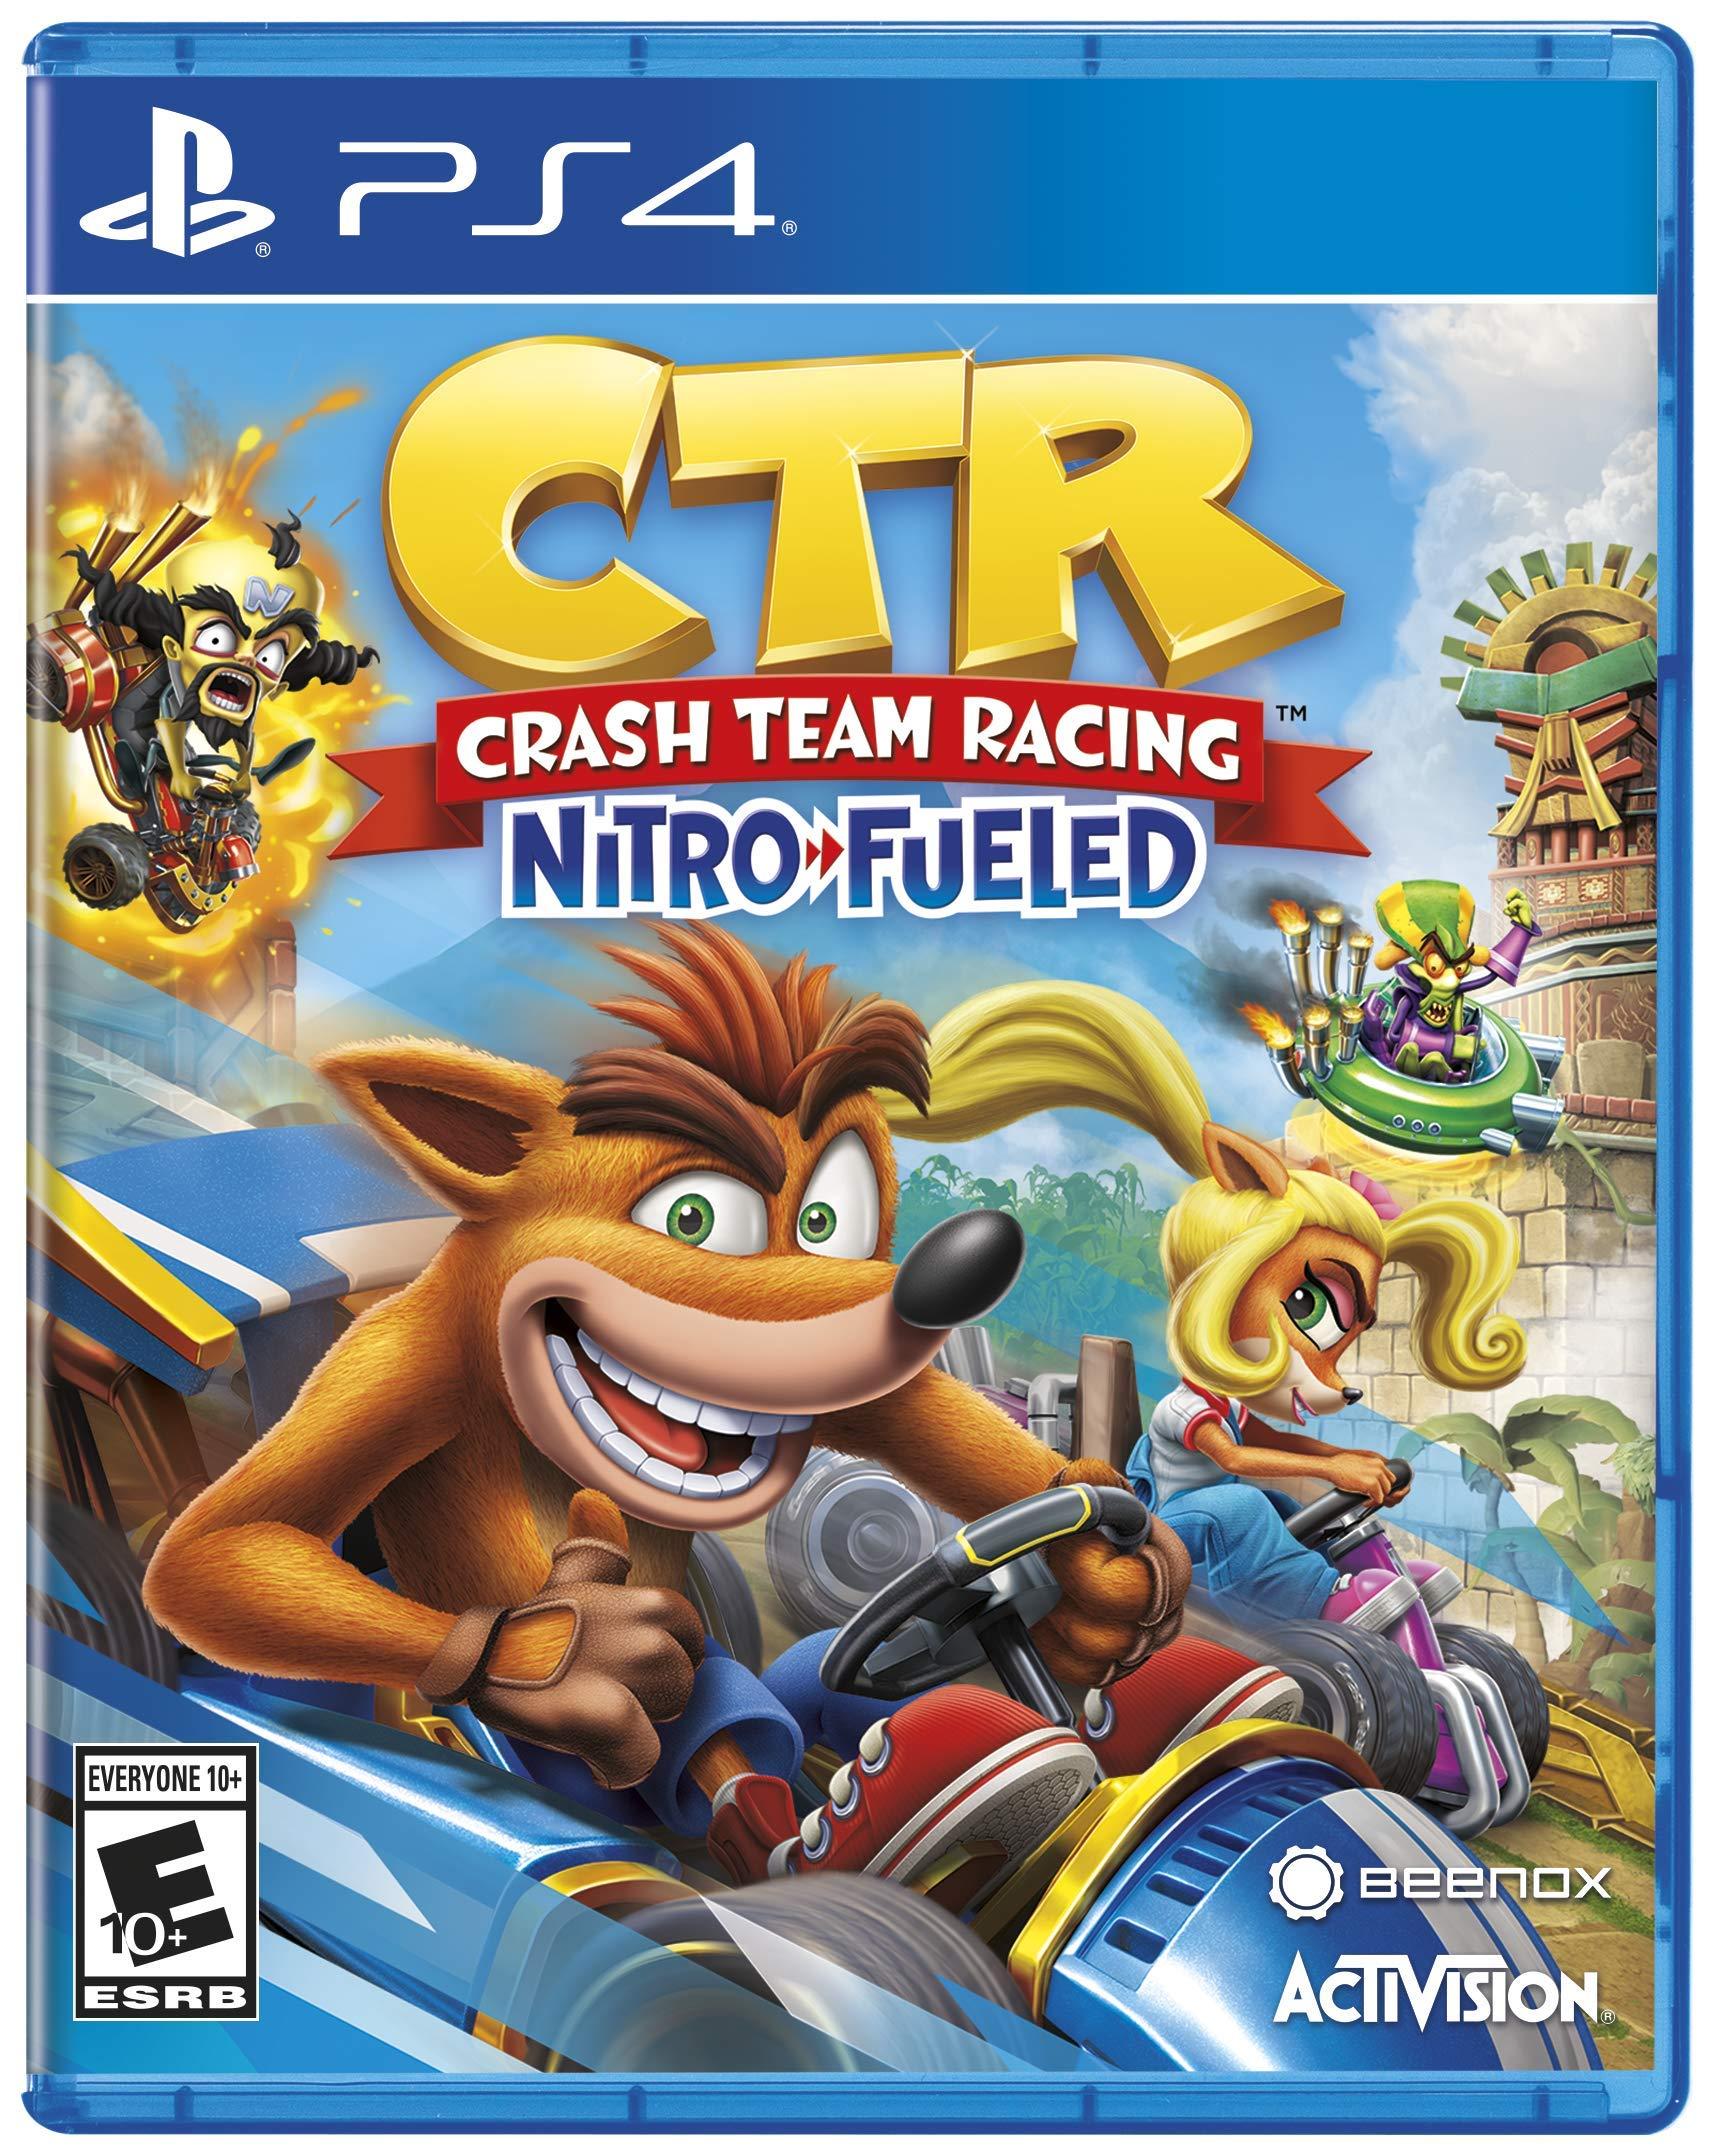 Crash Team Racing - Nitro Fueled - PlayStation 4 by Activision (Image #1)